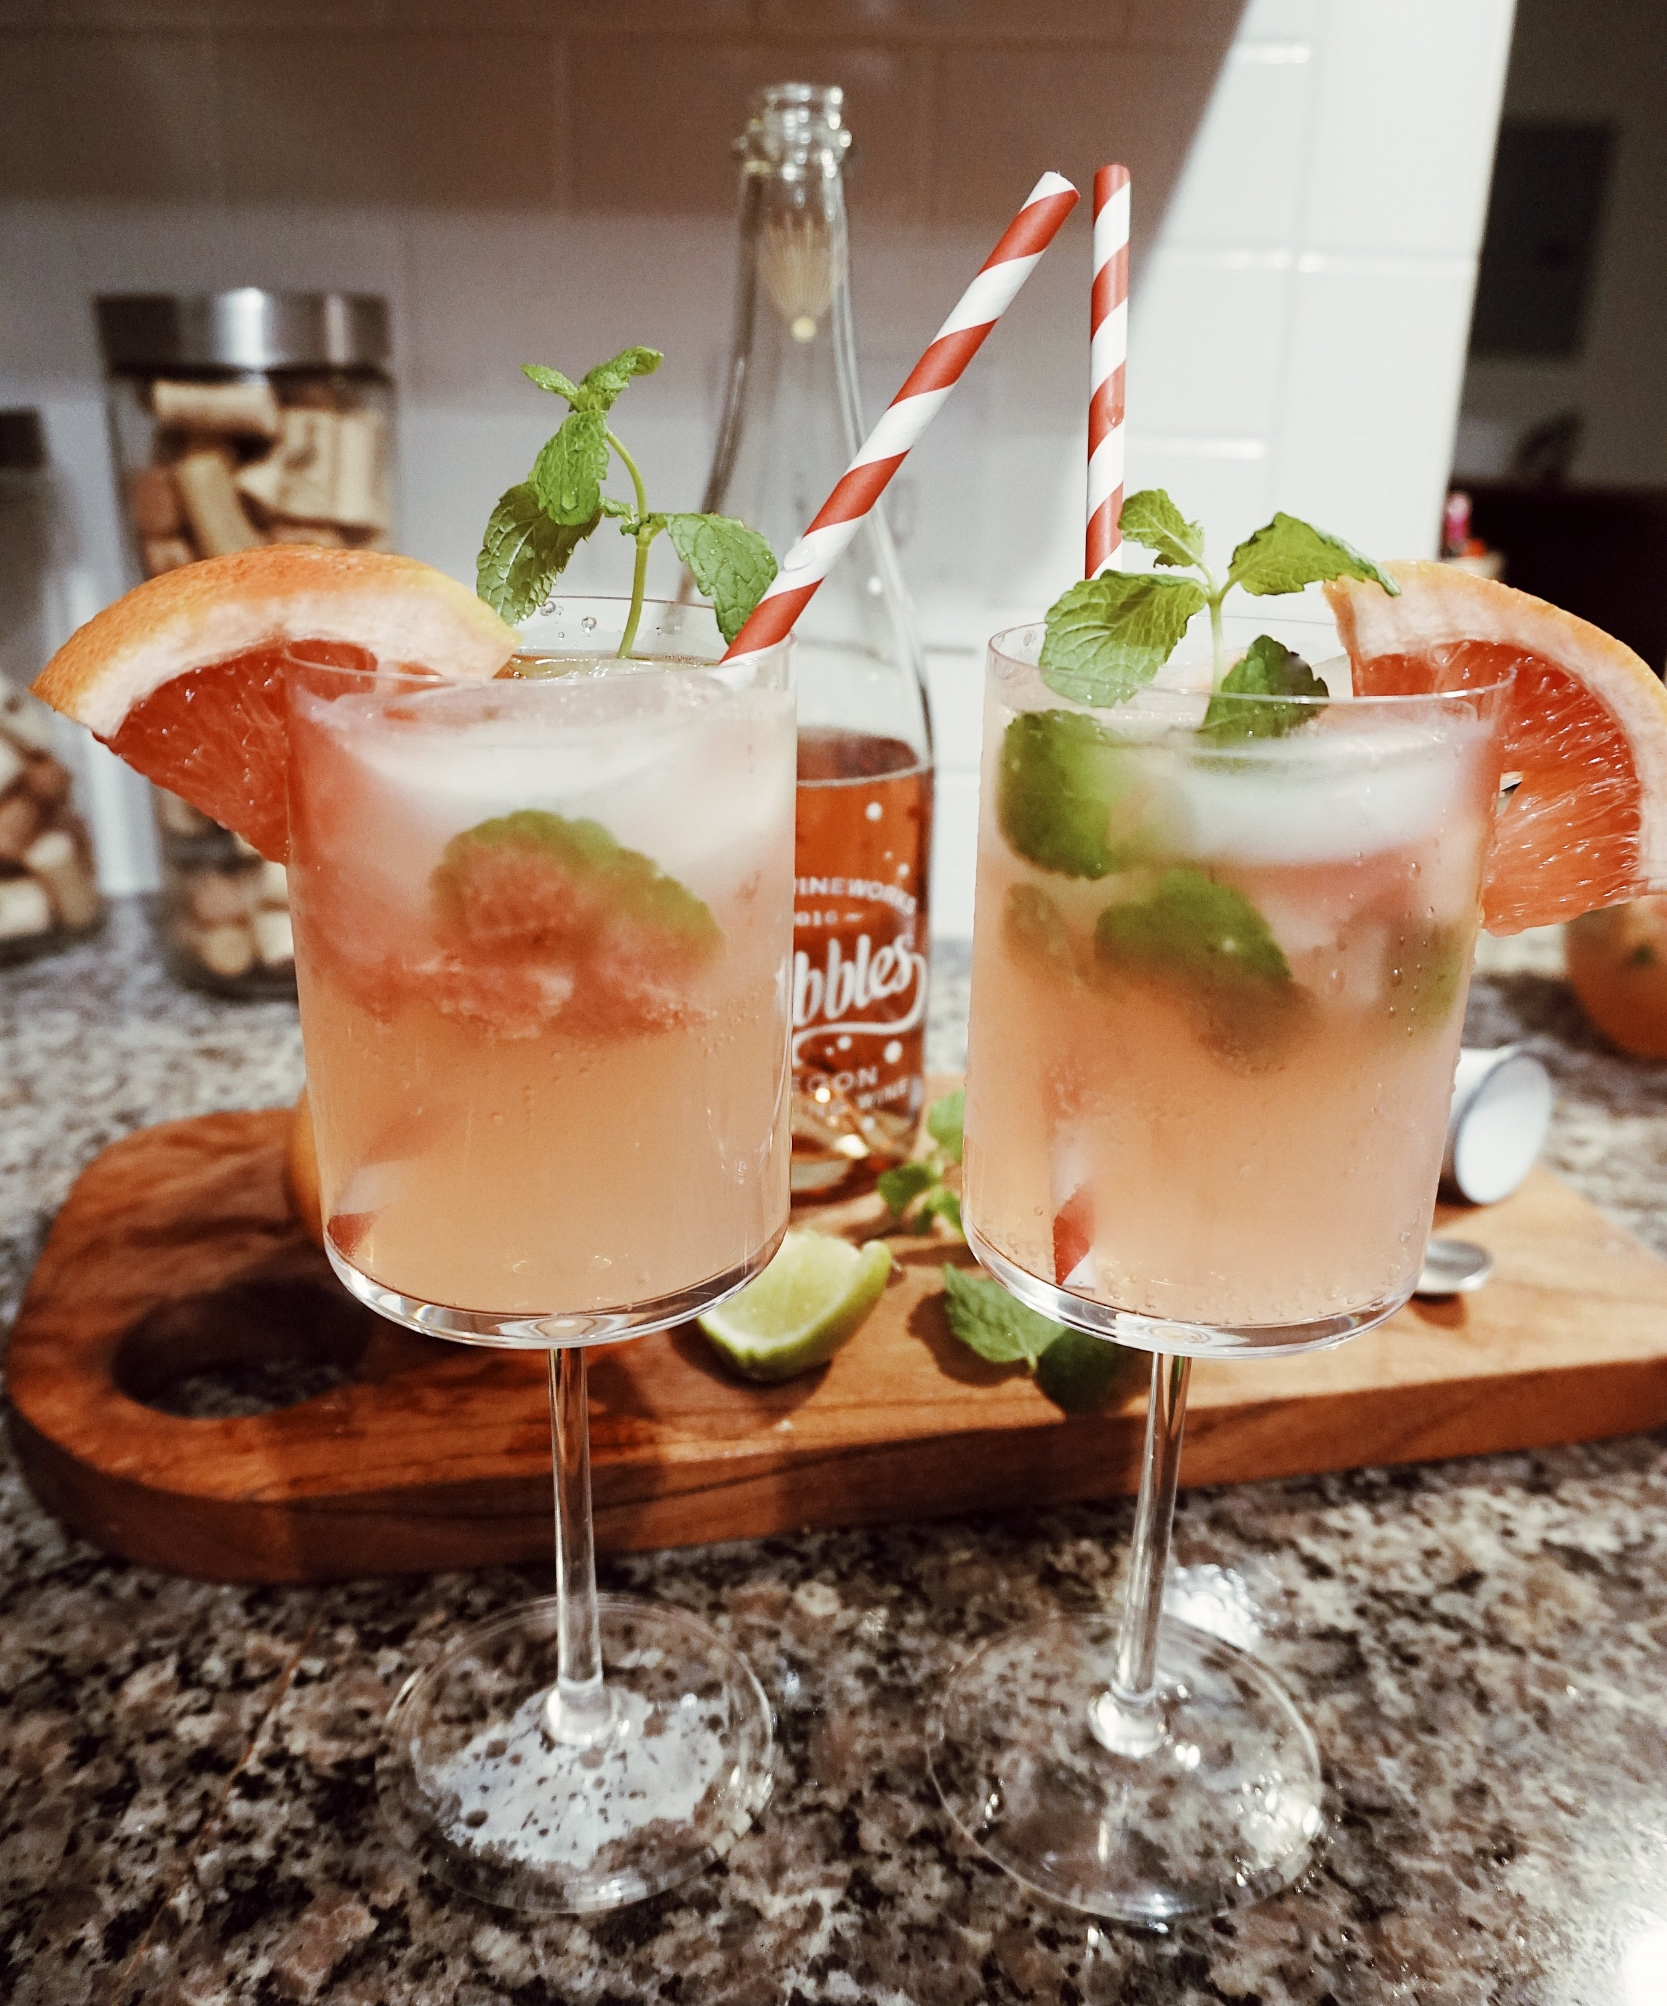 colls-cocktails-colleens-cocktails-sparkling-grapefruit-mojito.jpg